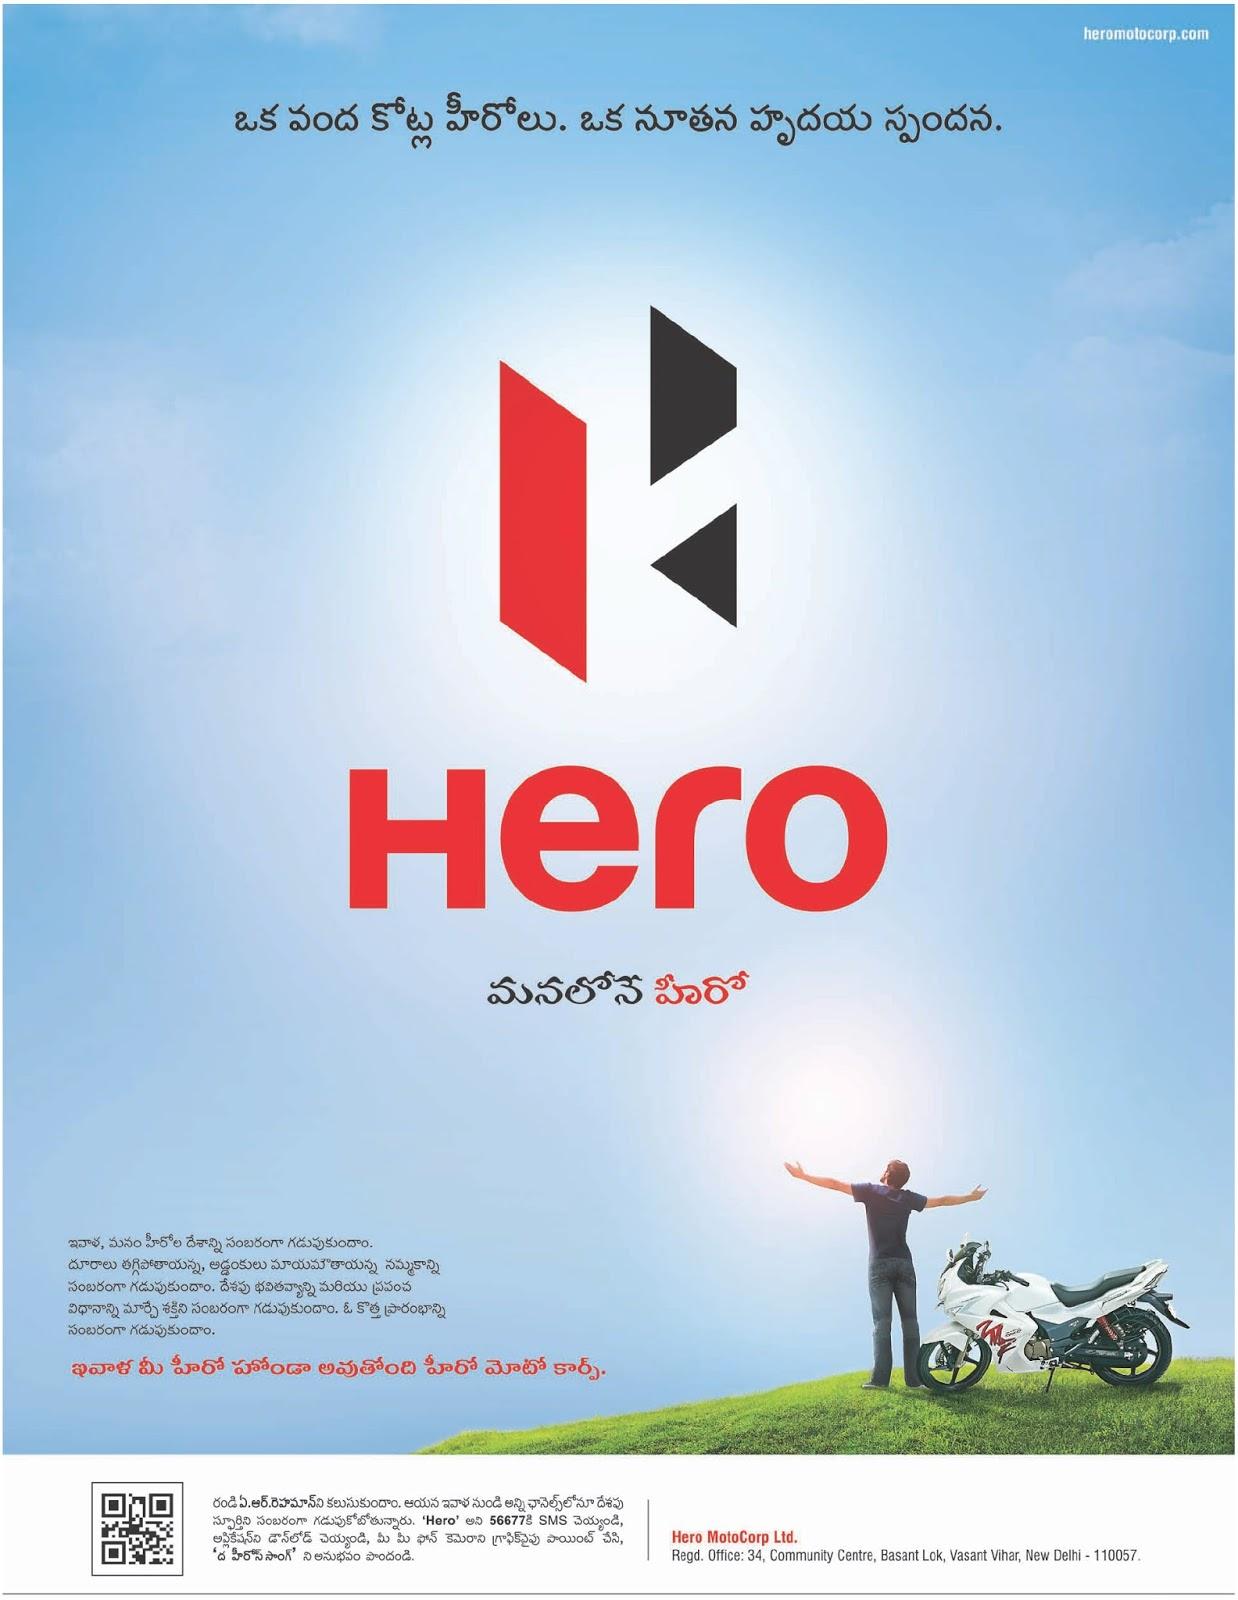 Hero Moto Corp Logo HD